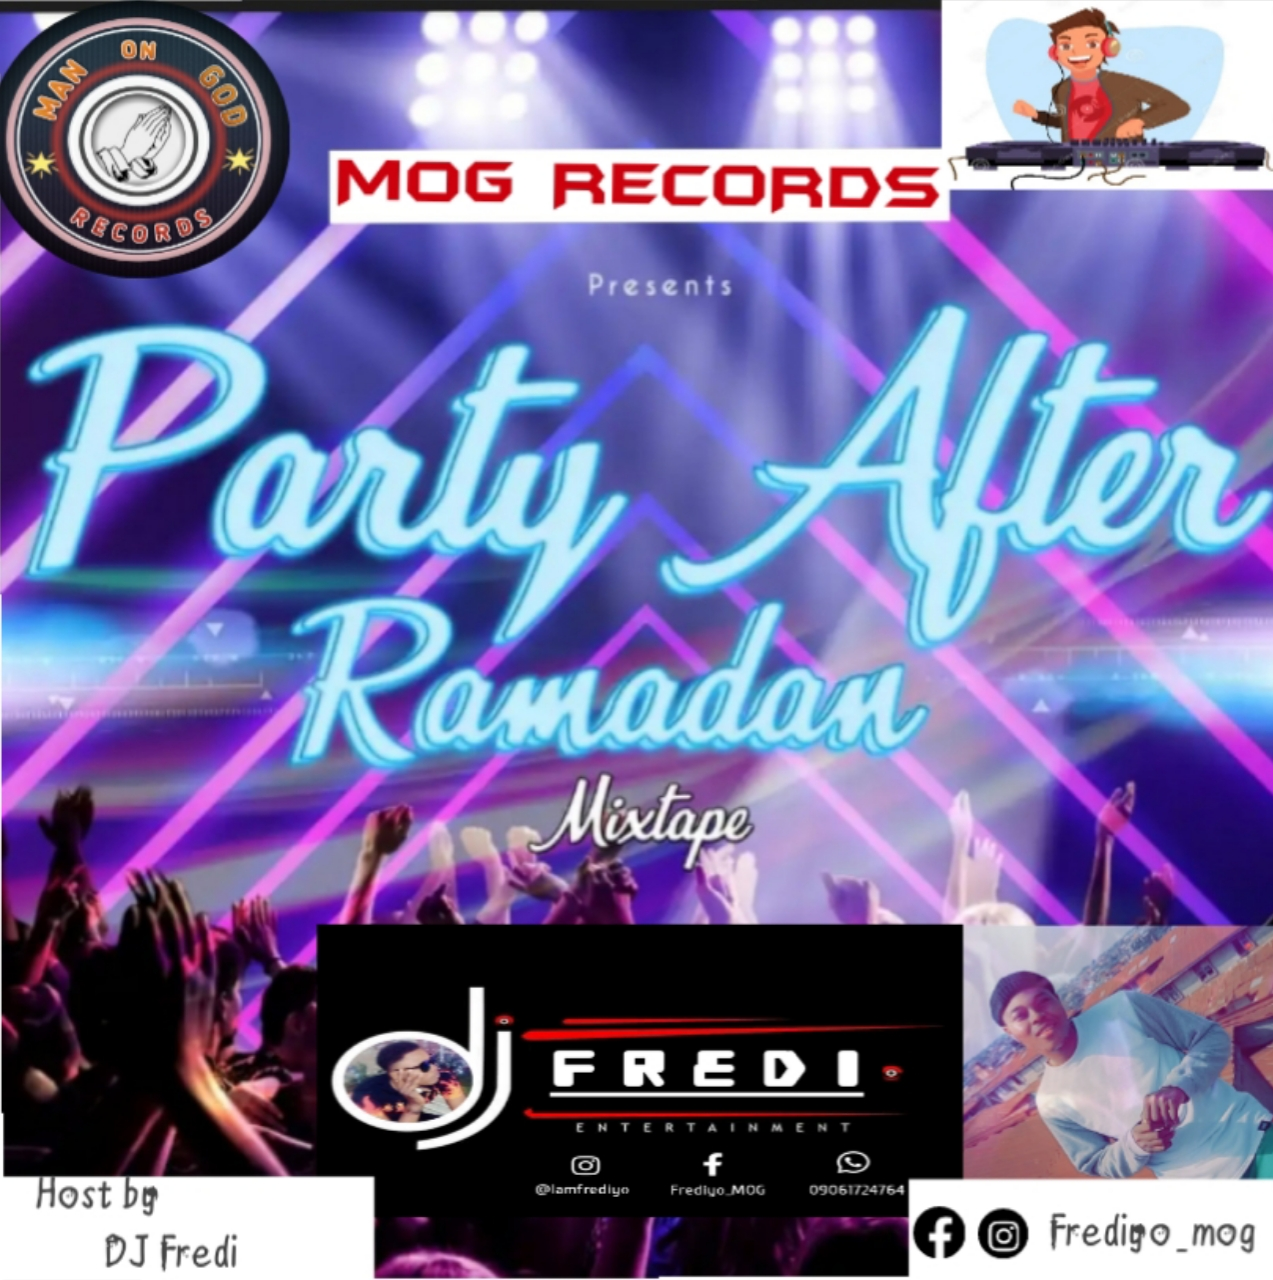 Frediyo Mog - DJ Fredi @Ramadan Festival Mixtape Ft K1 D Ultimate